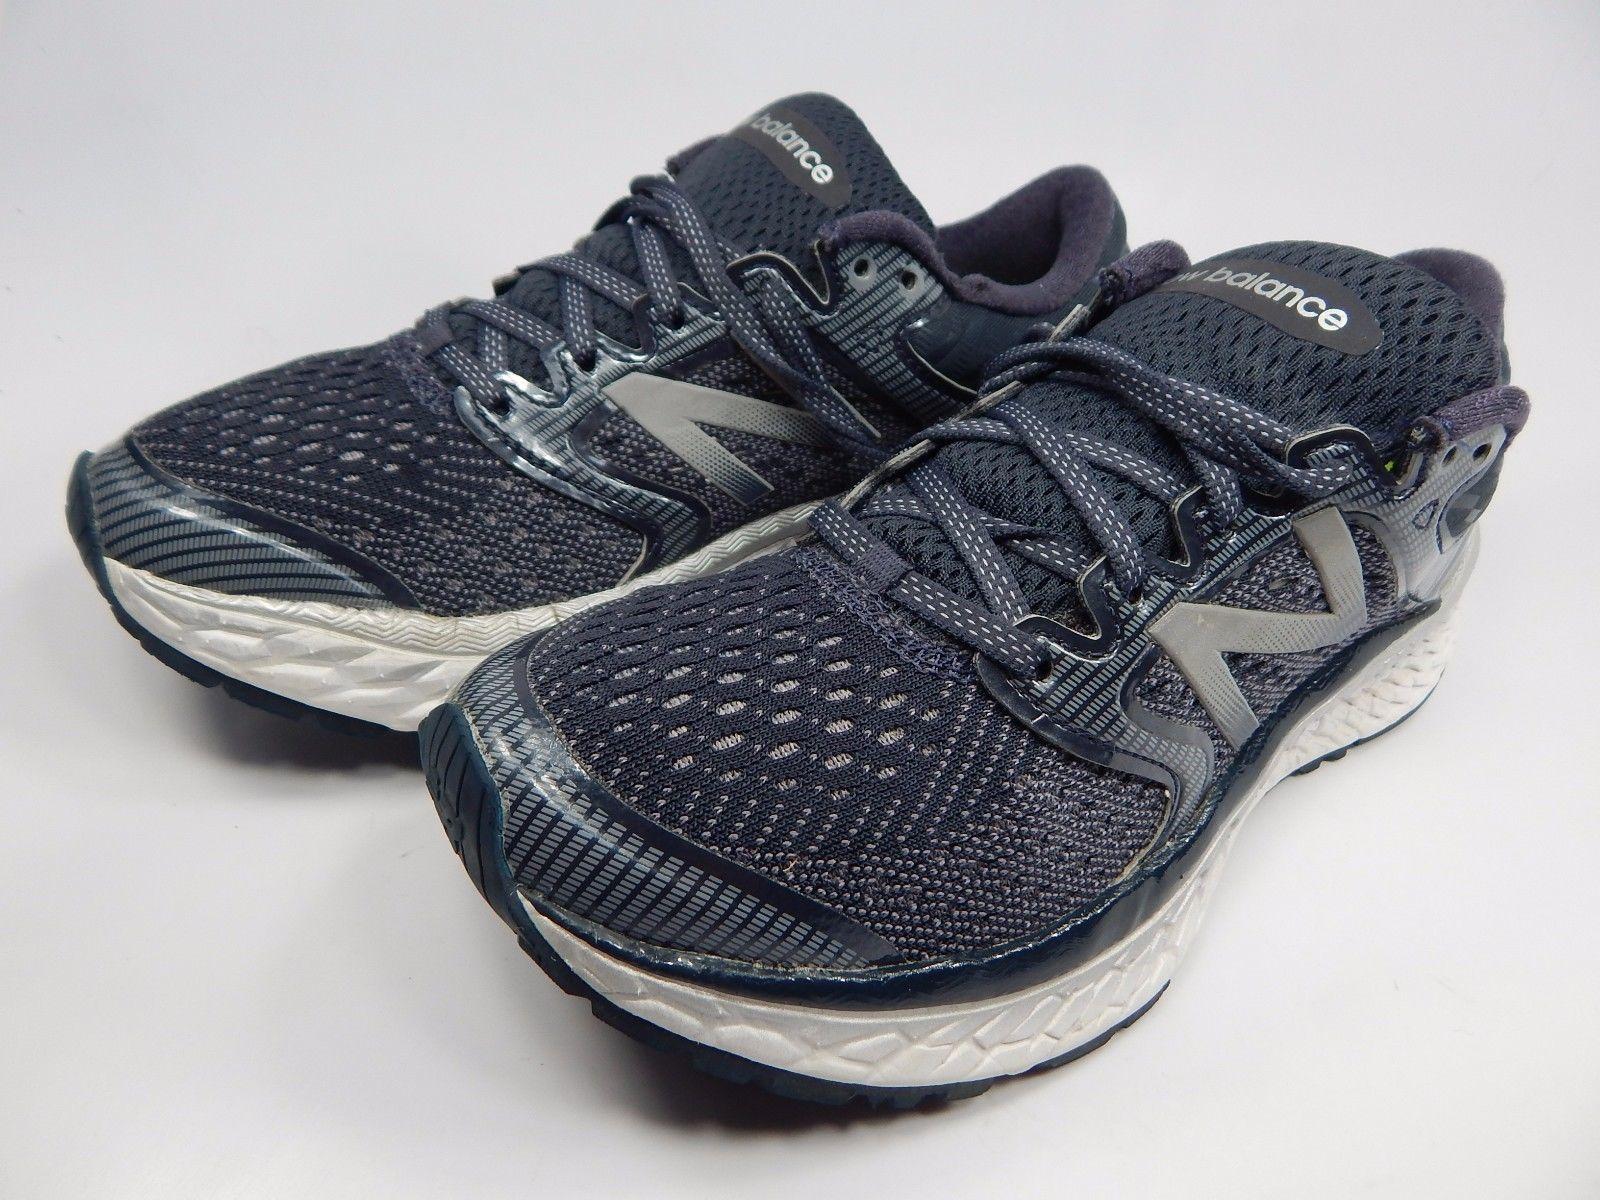 New Balance 1080 v7 Fresh Foam Women's Shoes Size US 8 M (B) EU 39 W1080BW7